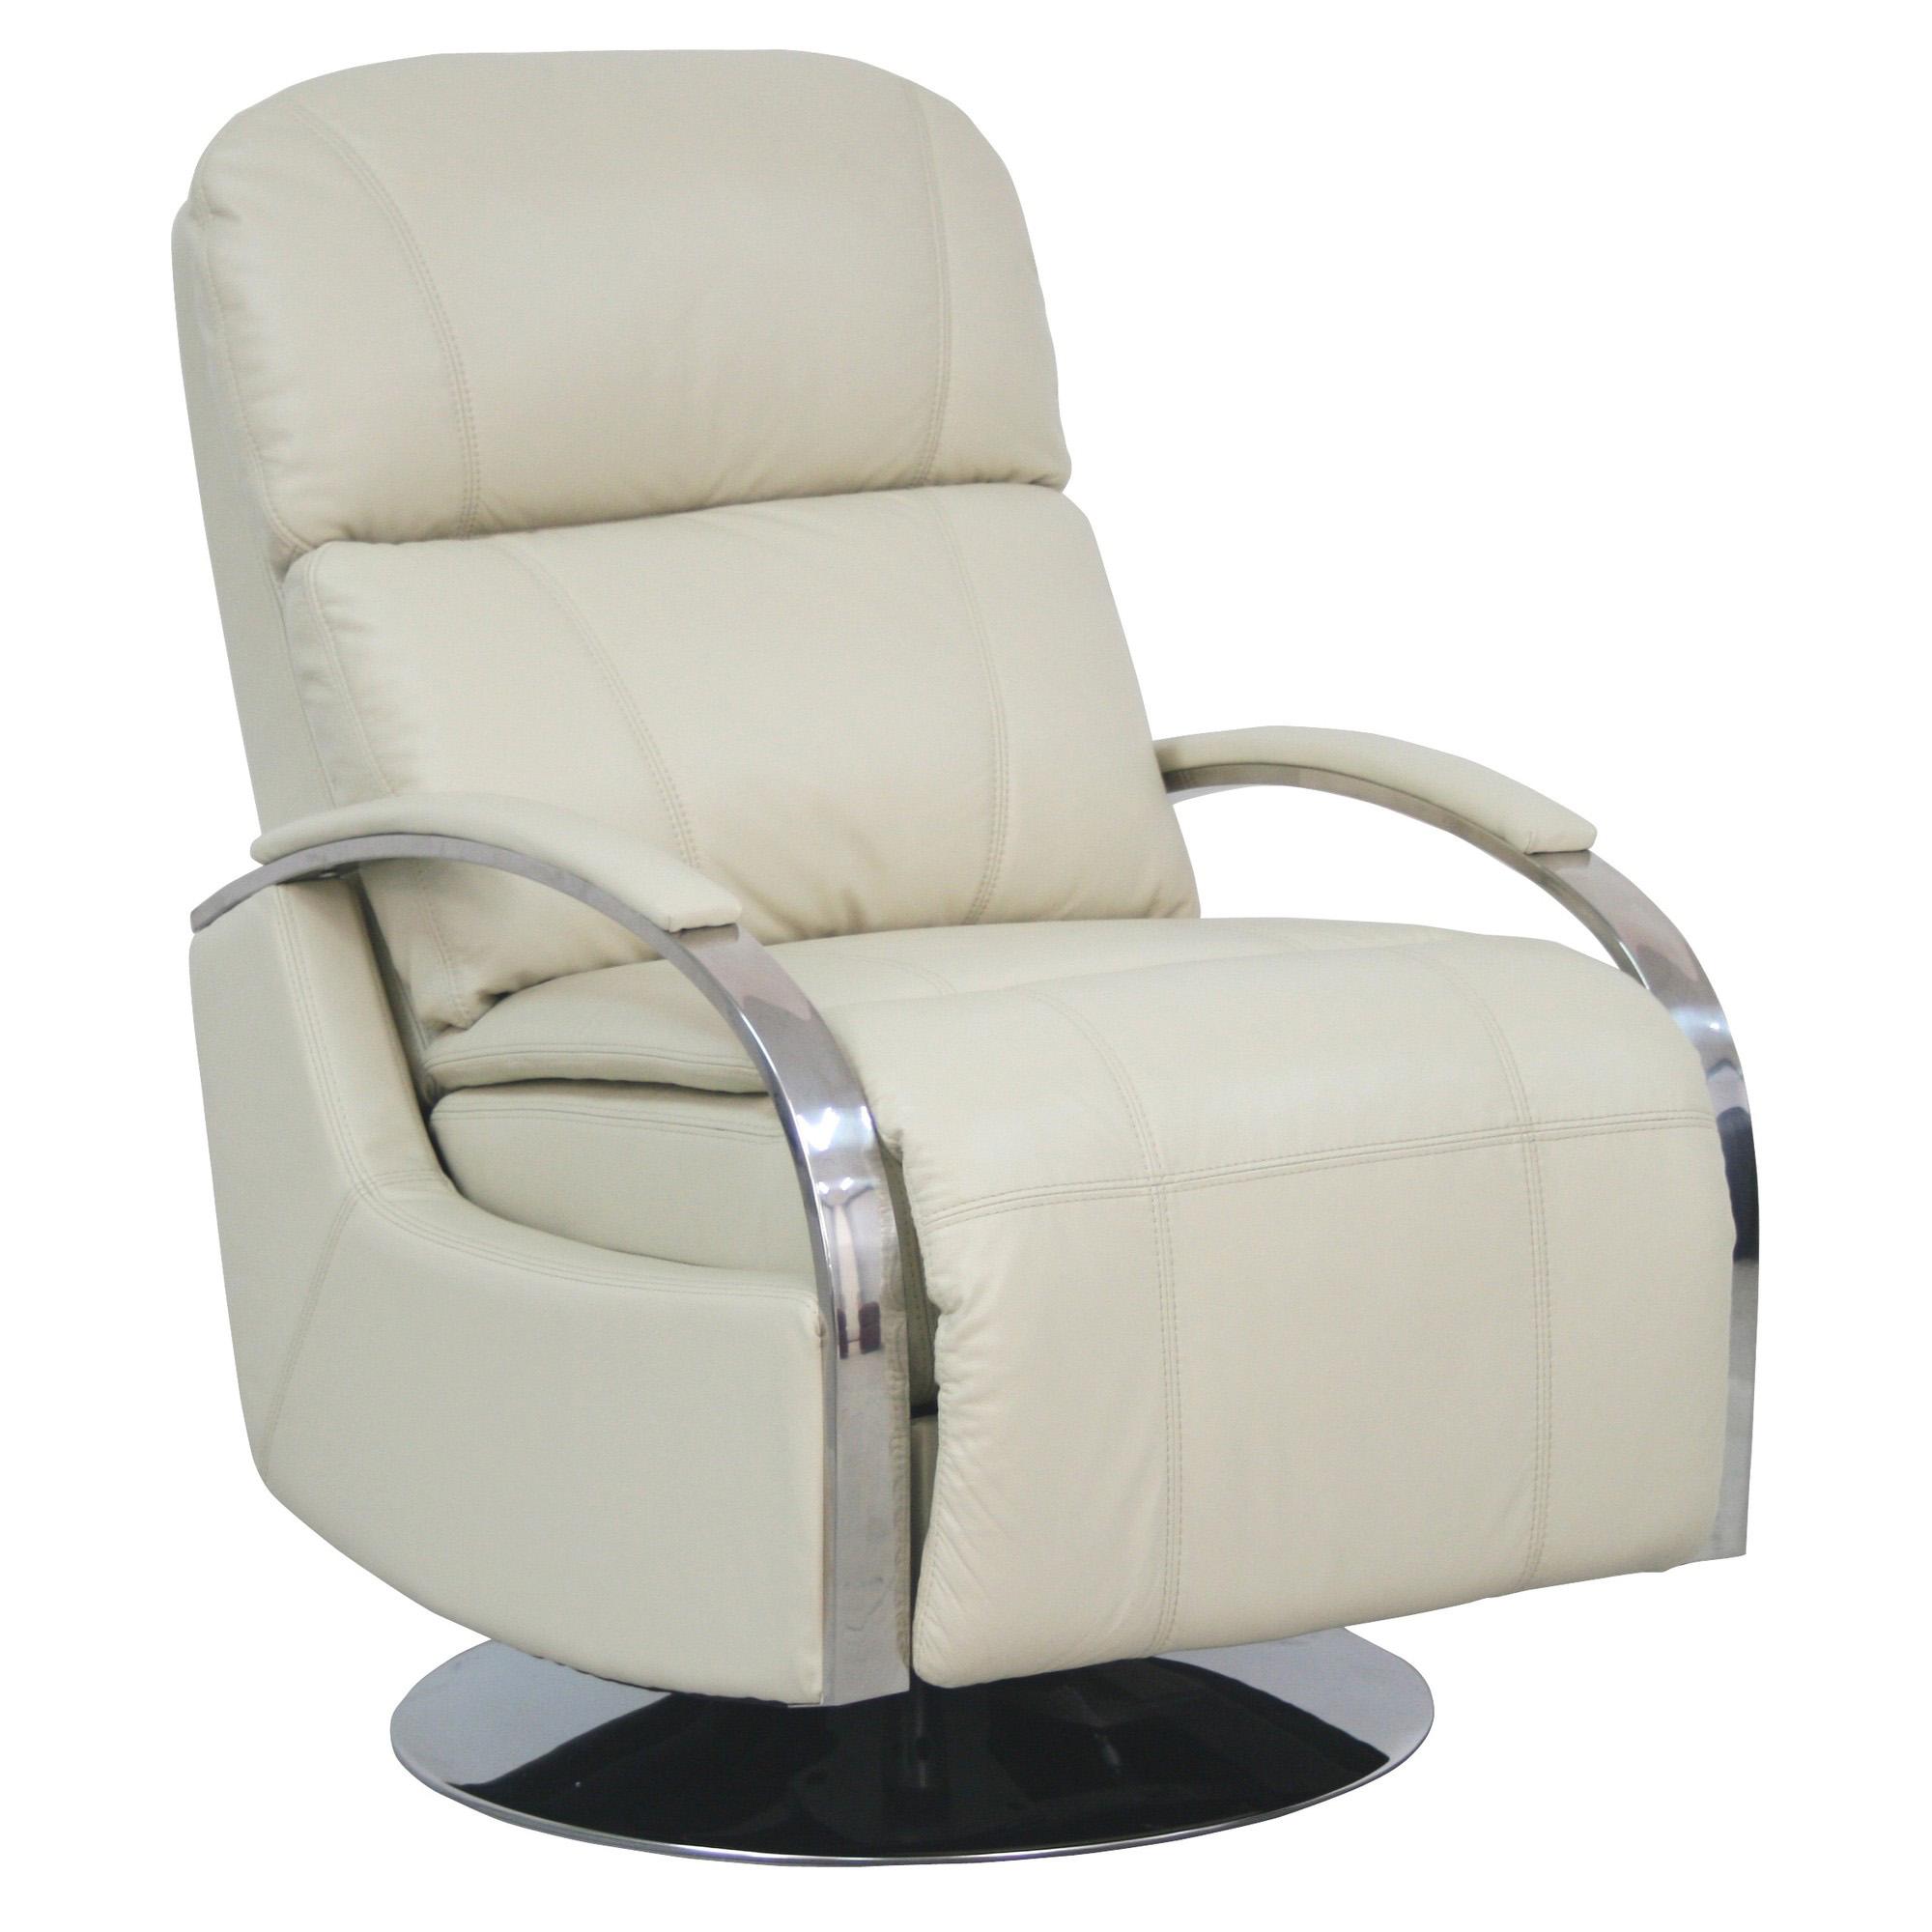 Barcalounger Regal II Cream Leather Recliner Chair  sc 1 st  Stressless Recliner Chair and Ottoman from Ekornes Human Touch Zero ... & Barcalounger Regal II Leather Recliner Chair - Leather Recliner ...